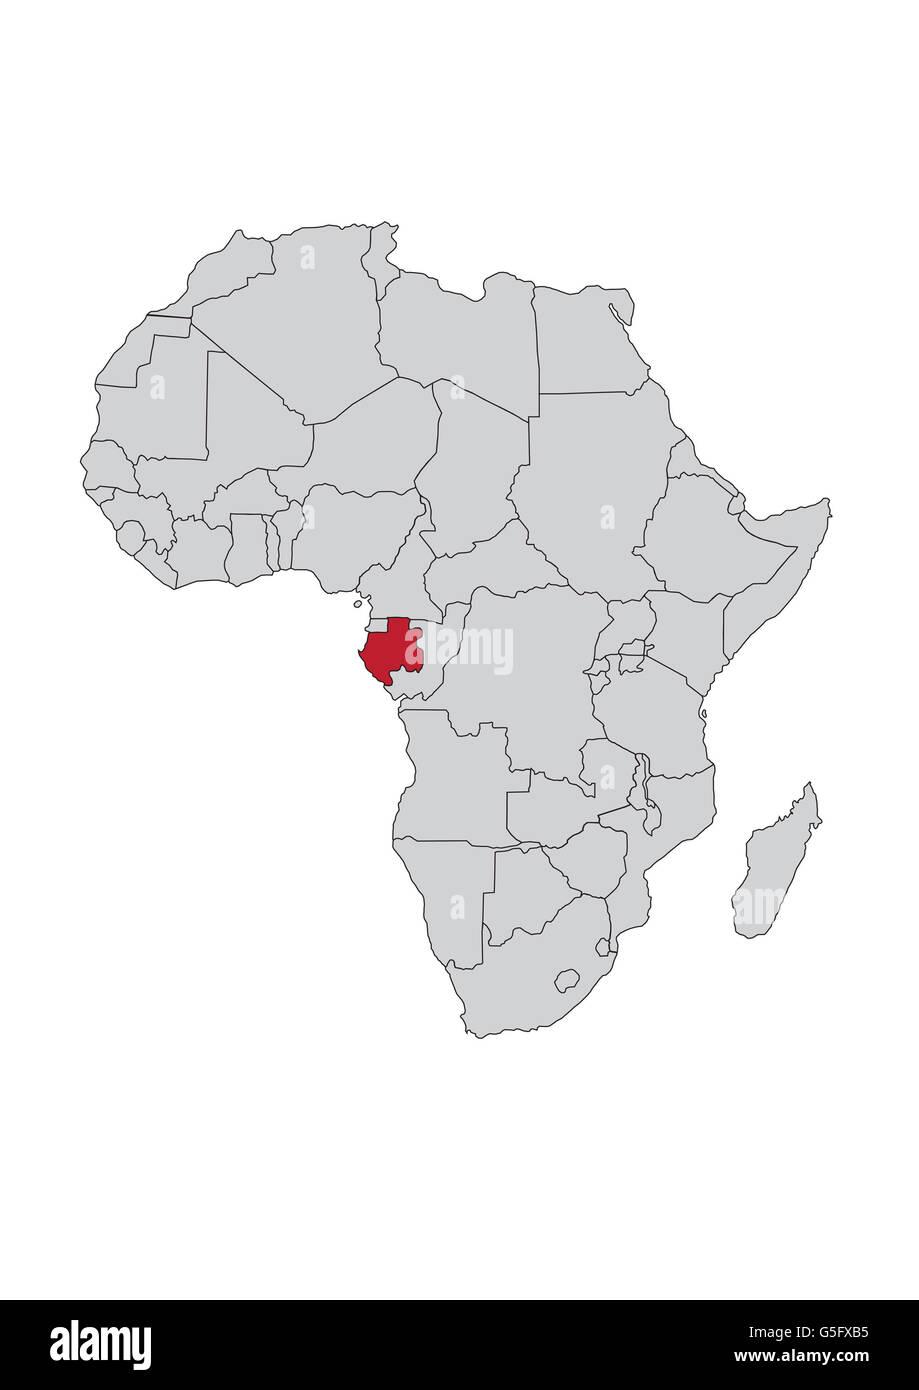 Map Of Africa Gabon Stock Photo 106685465 Alamy